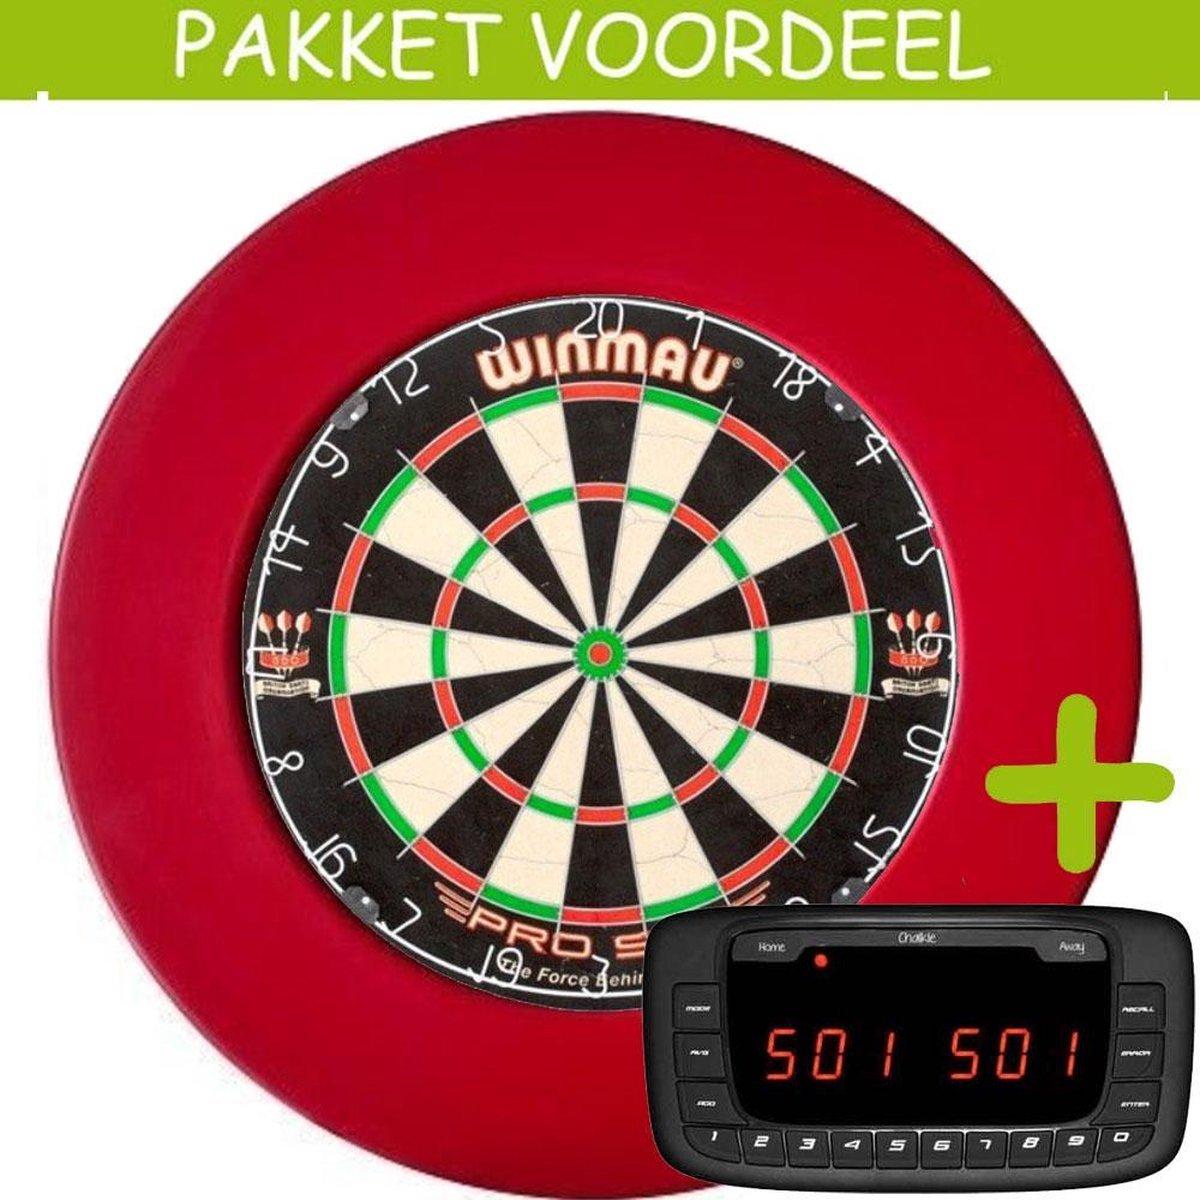 Elektronisch Dart Scorebord VoordeelPakket (Chalkie ) - Pro SFB - Rubberen Surround (Rood)